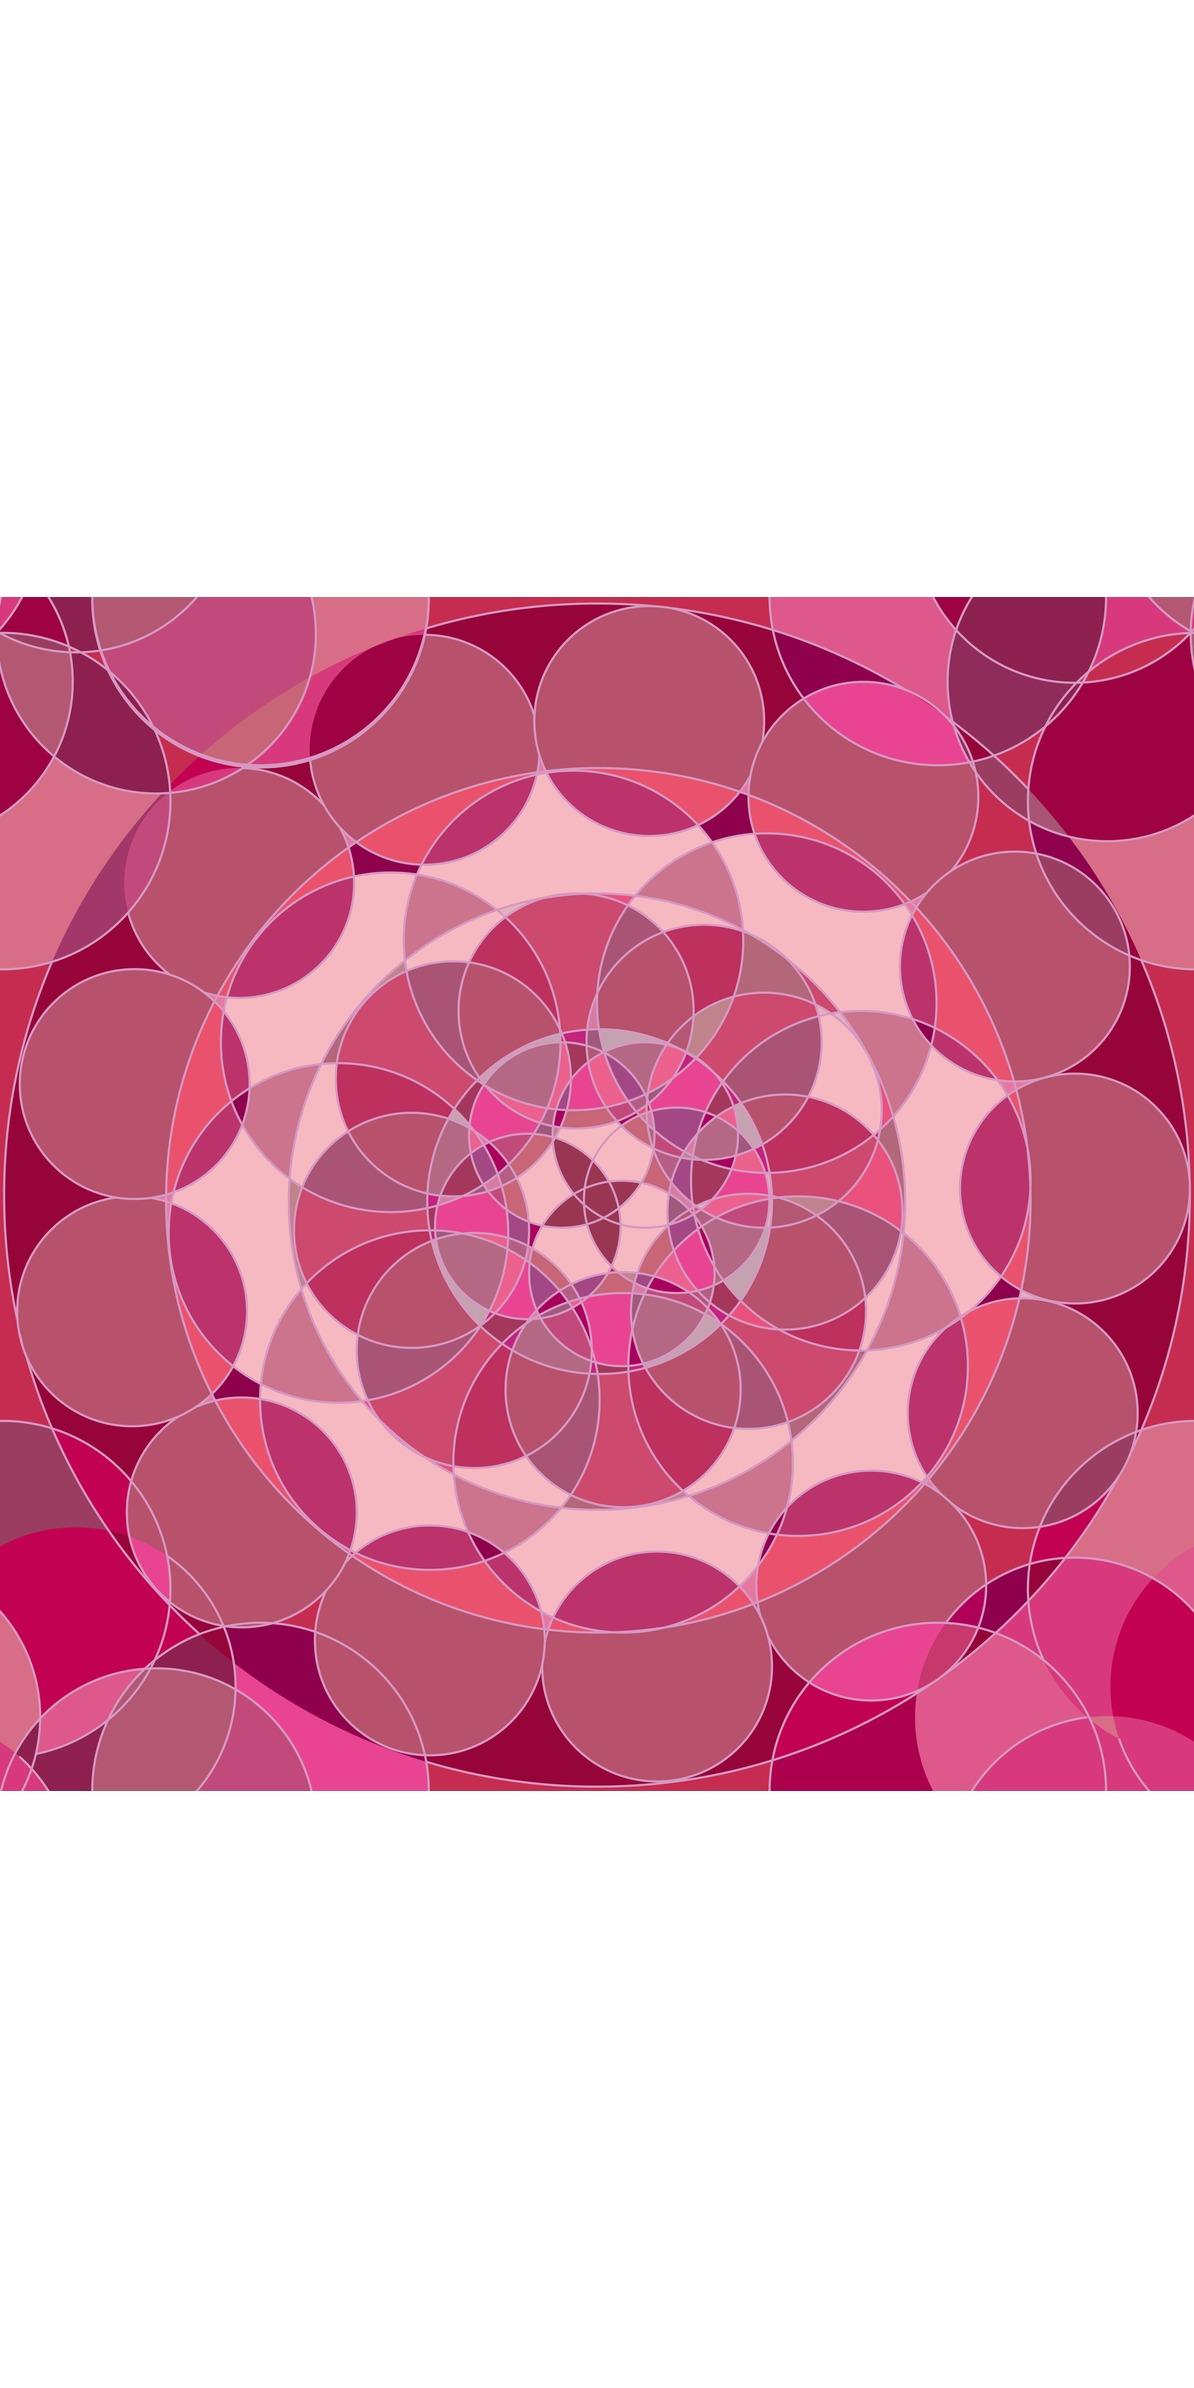 Rrrrrrrcircle_princess_contest198949preview